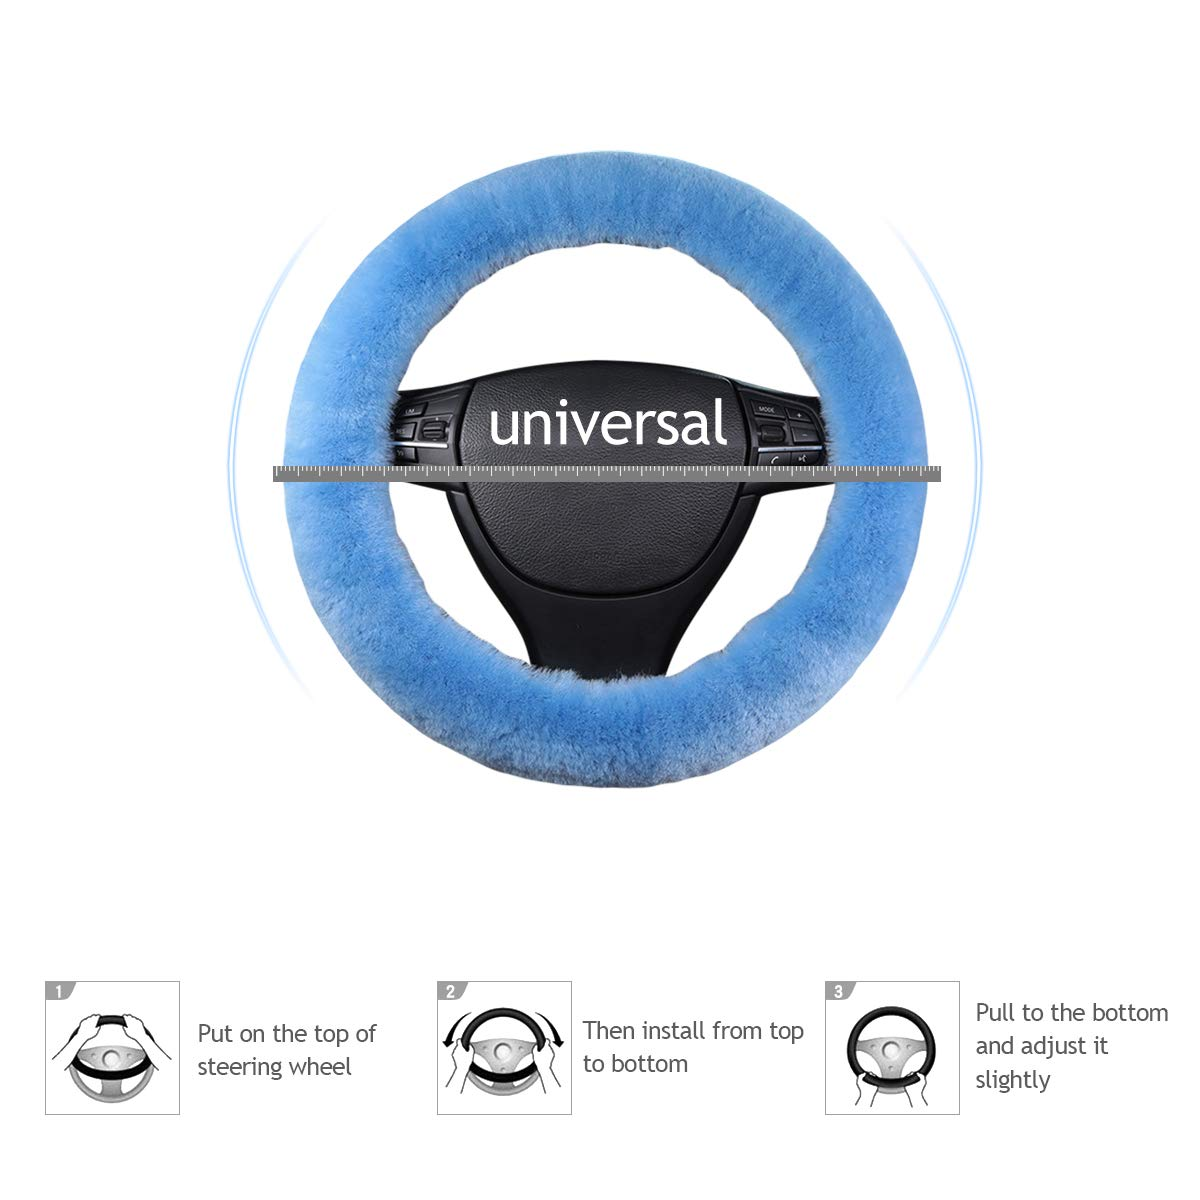 Gris Azul Ergocar Lana Pura Funda para Volante de Coche Suave Universal Antideslizante Invierno C/álido Protector del Volante del Coche